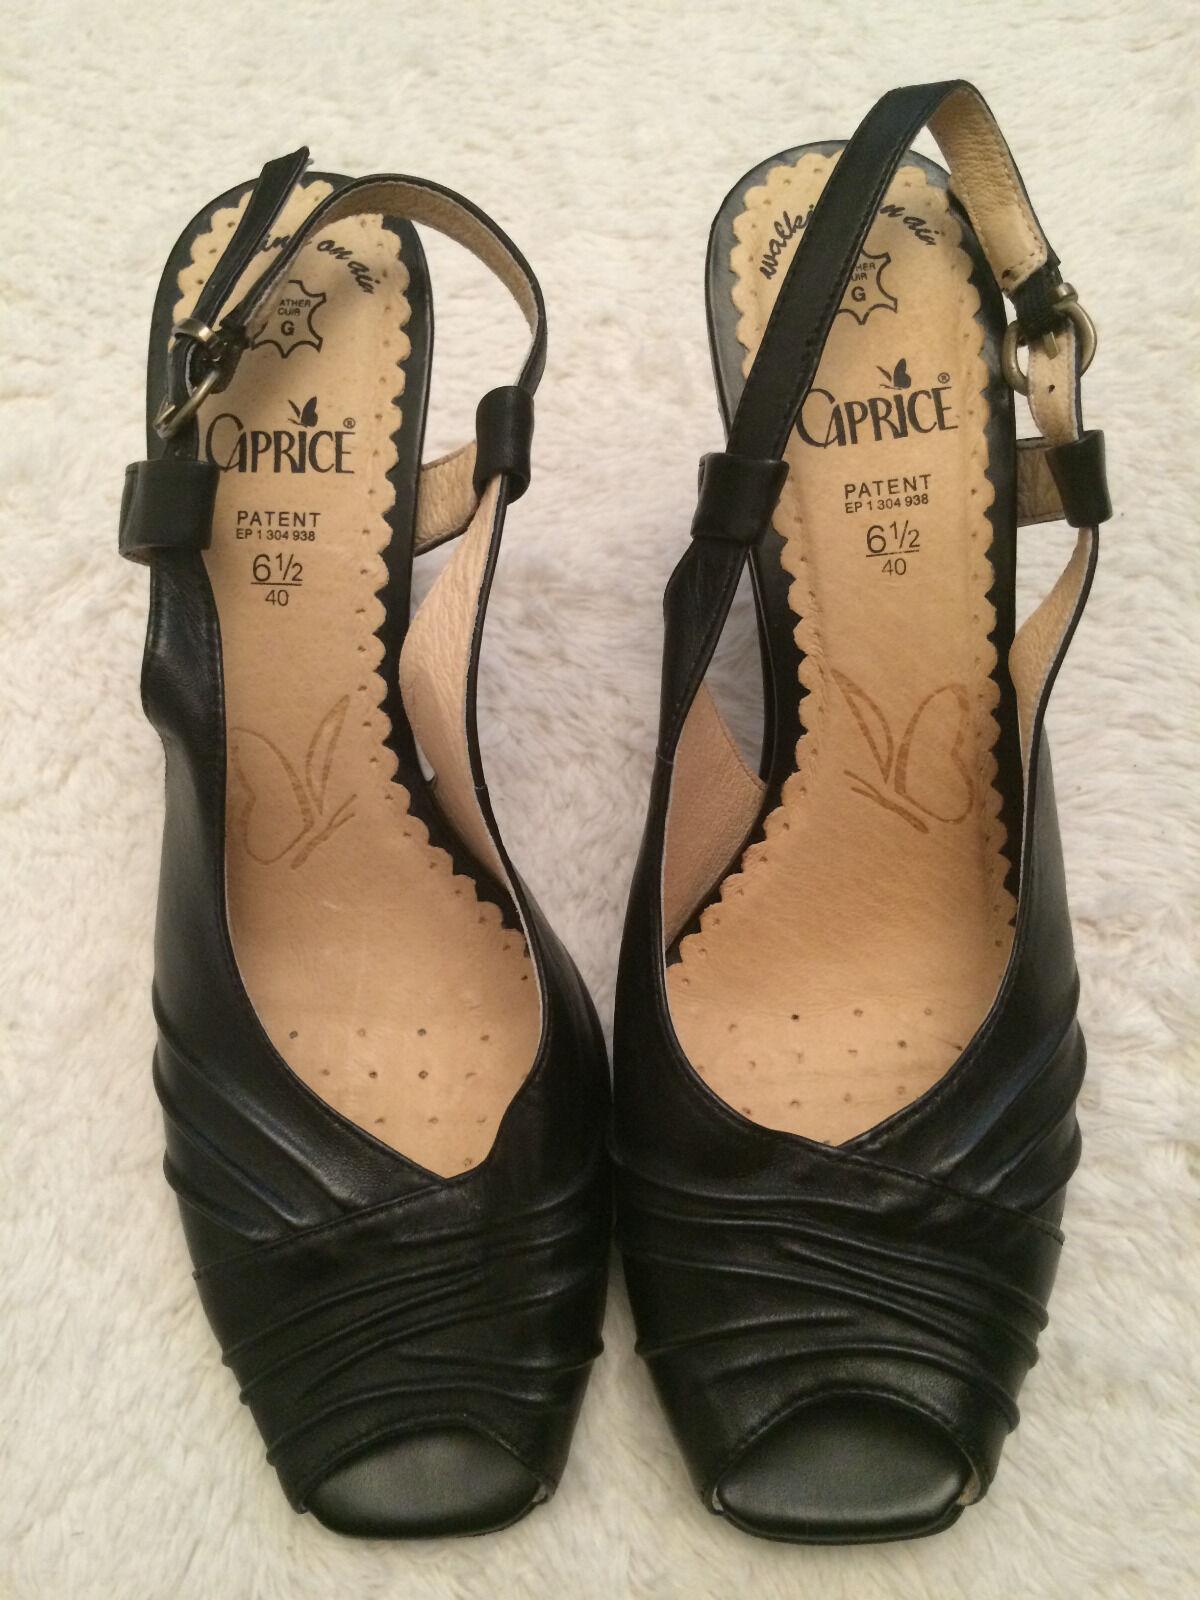 Damen Peeptoe Pumps, Sandaletten, schwarz, Gr. 40   6 ½, Caprice, NEU